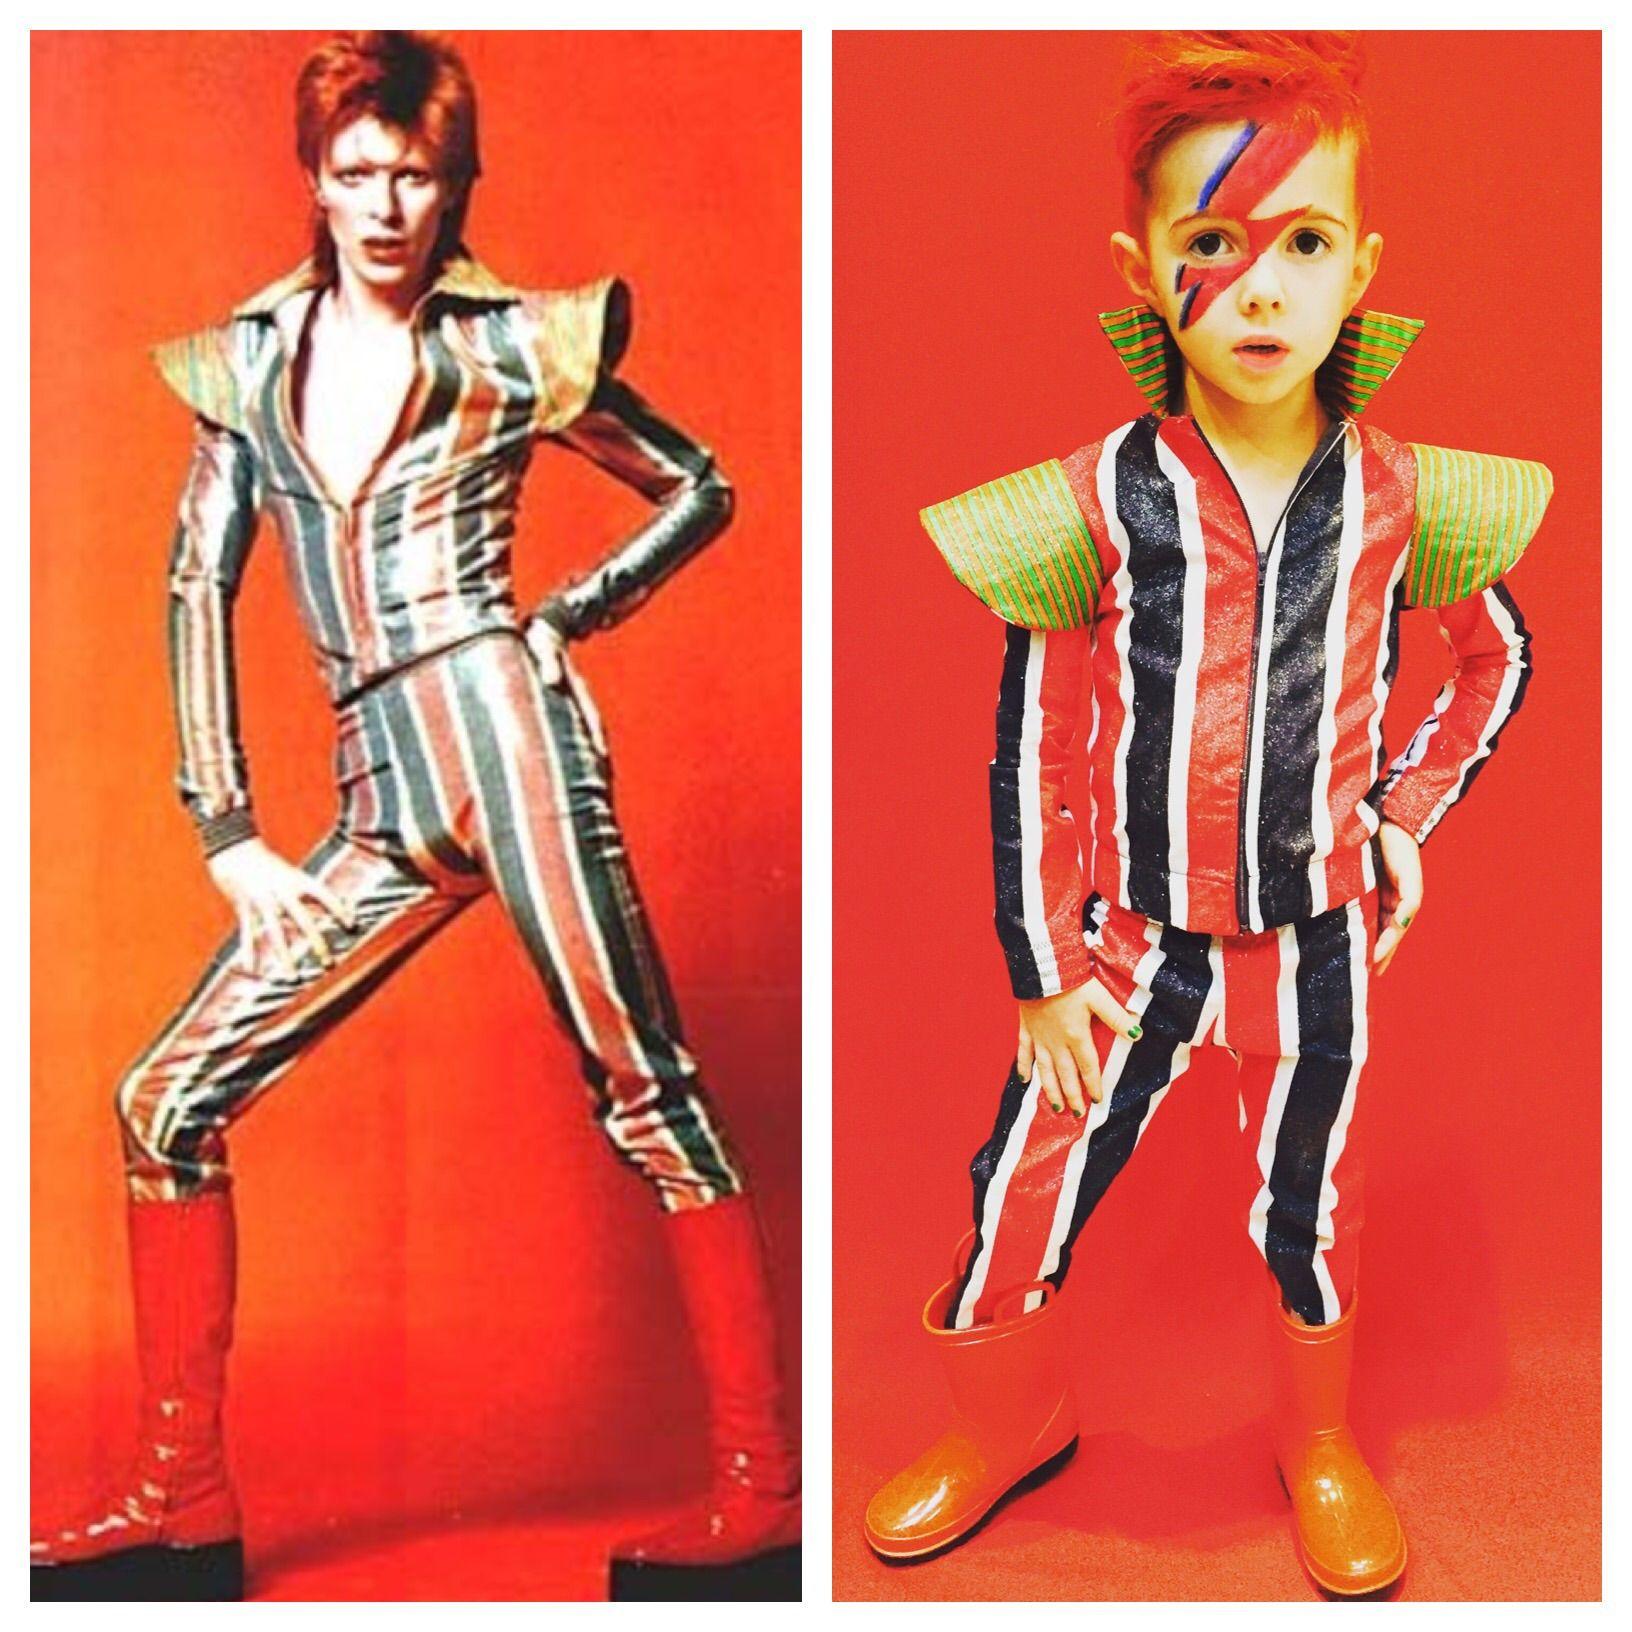 David Bowie Halloween Costume / Ziggy Stardust / Aladdin Sane / Kidu0027s Costume  sc 1 st  Pinterest & David Bowie Halloween Costume / Ziggy Stardust / Aladdin Sane ...